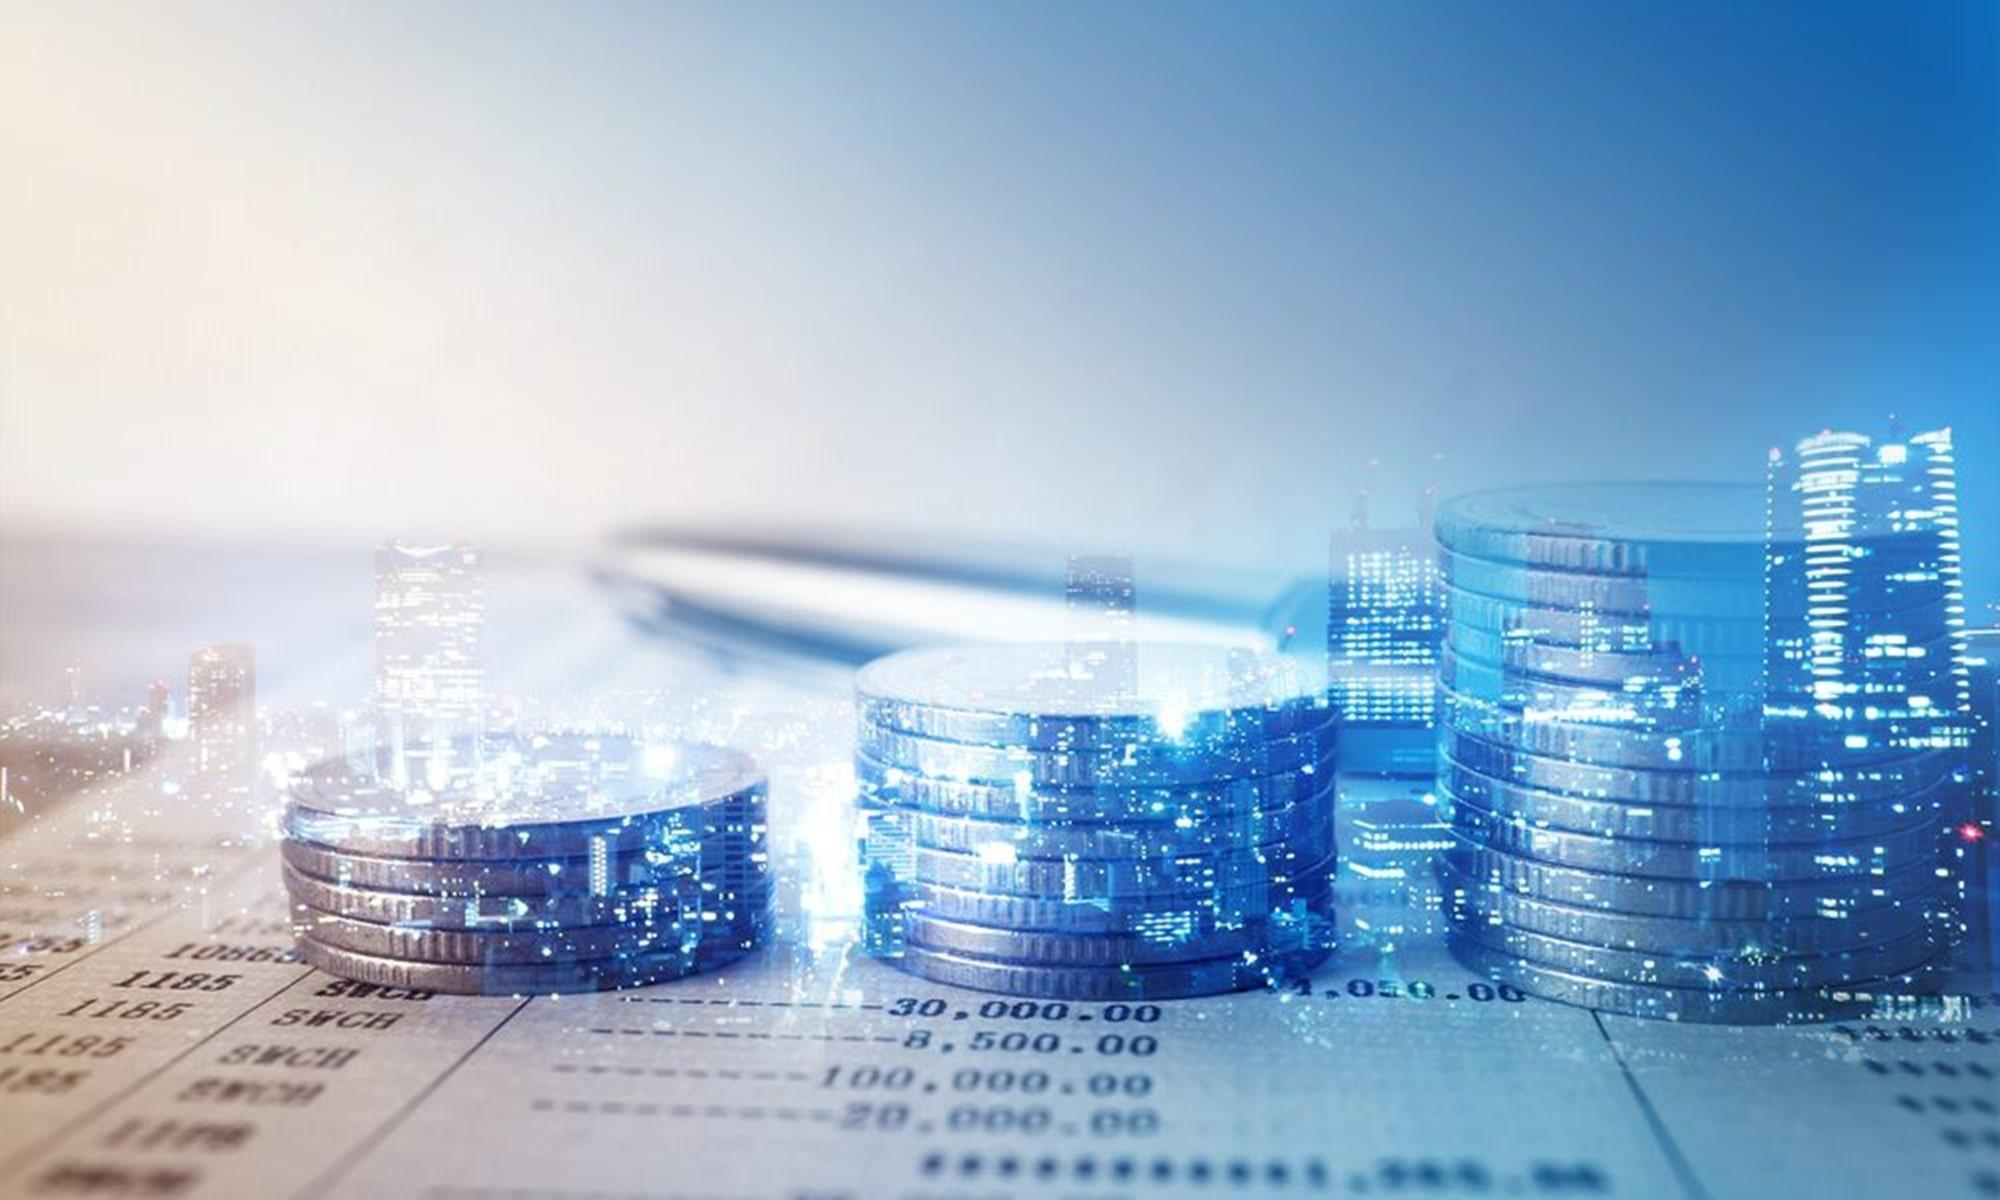 yapi kredi vadeli mevdauat hesabi nitelikleri